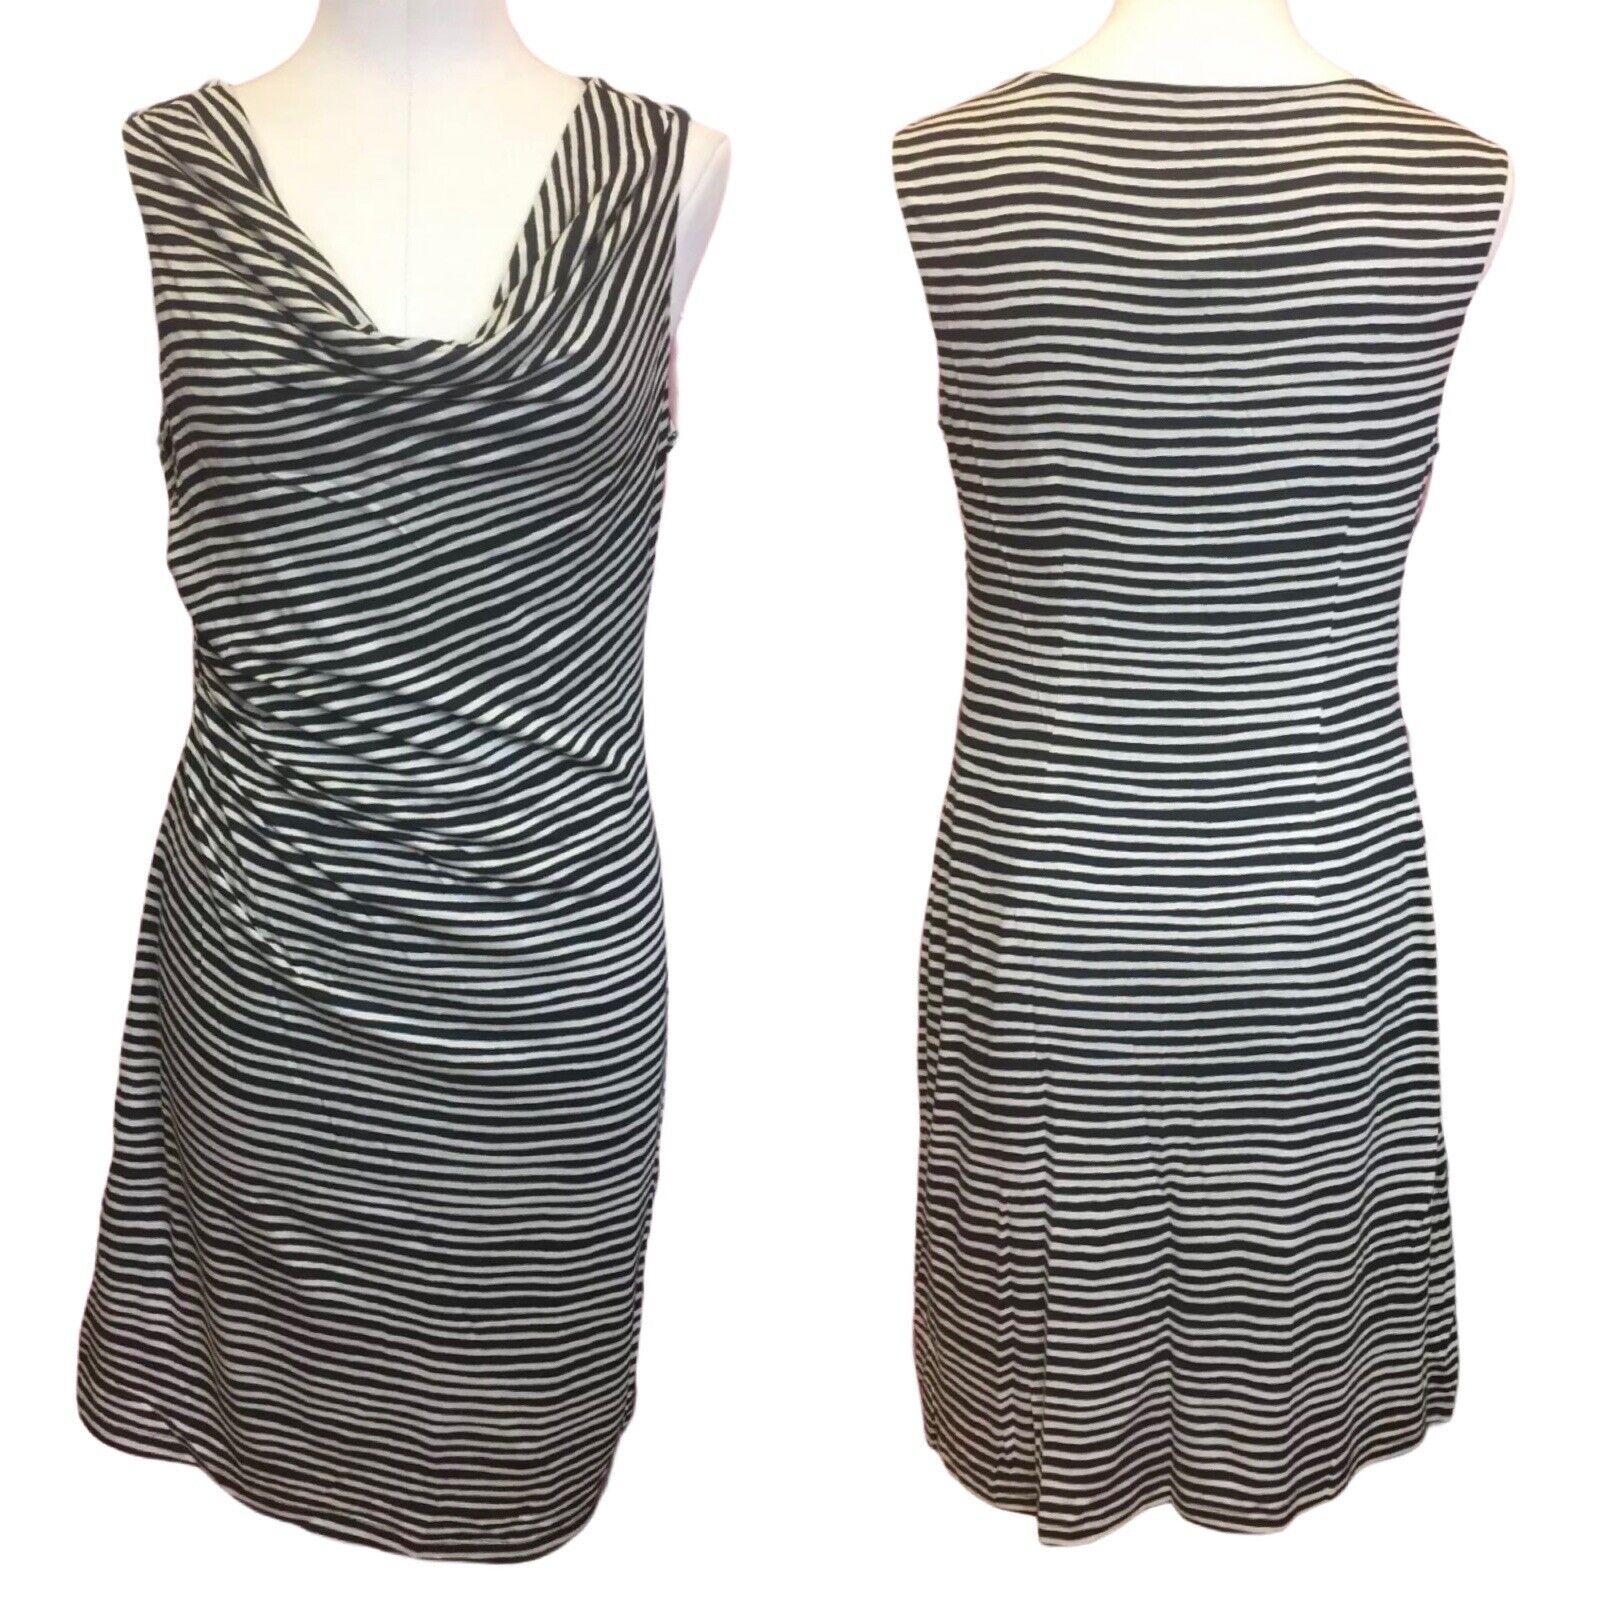 Loft Womens Dress sz M Black White Striped Sleeveless Ruched New AB7